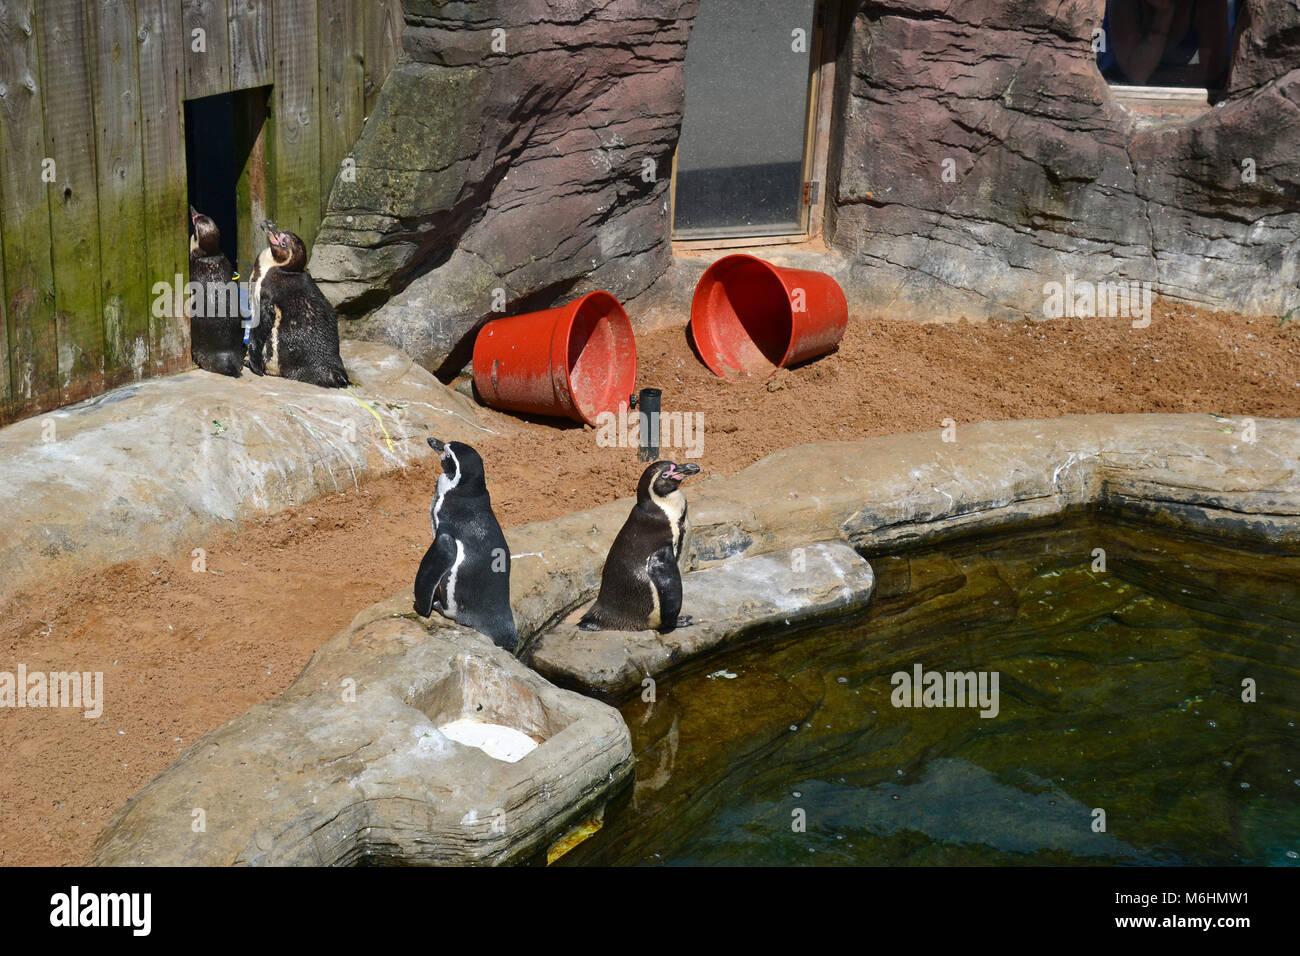 Humboldt Penguins at Gweek Seal Sanctuary Cornwall - Stock Image